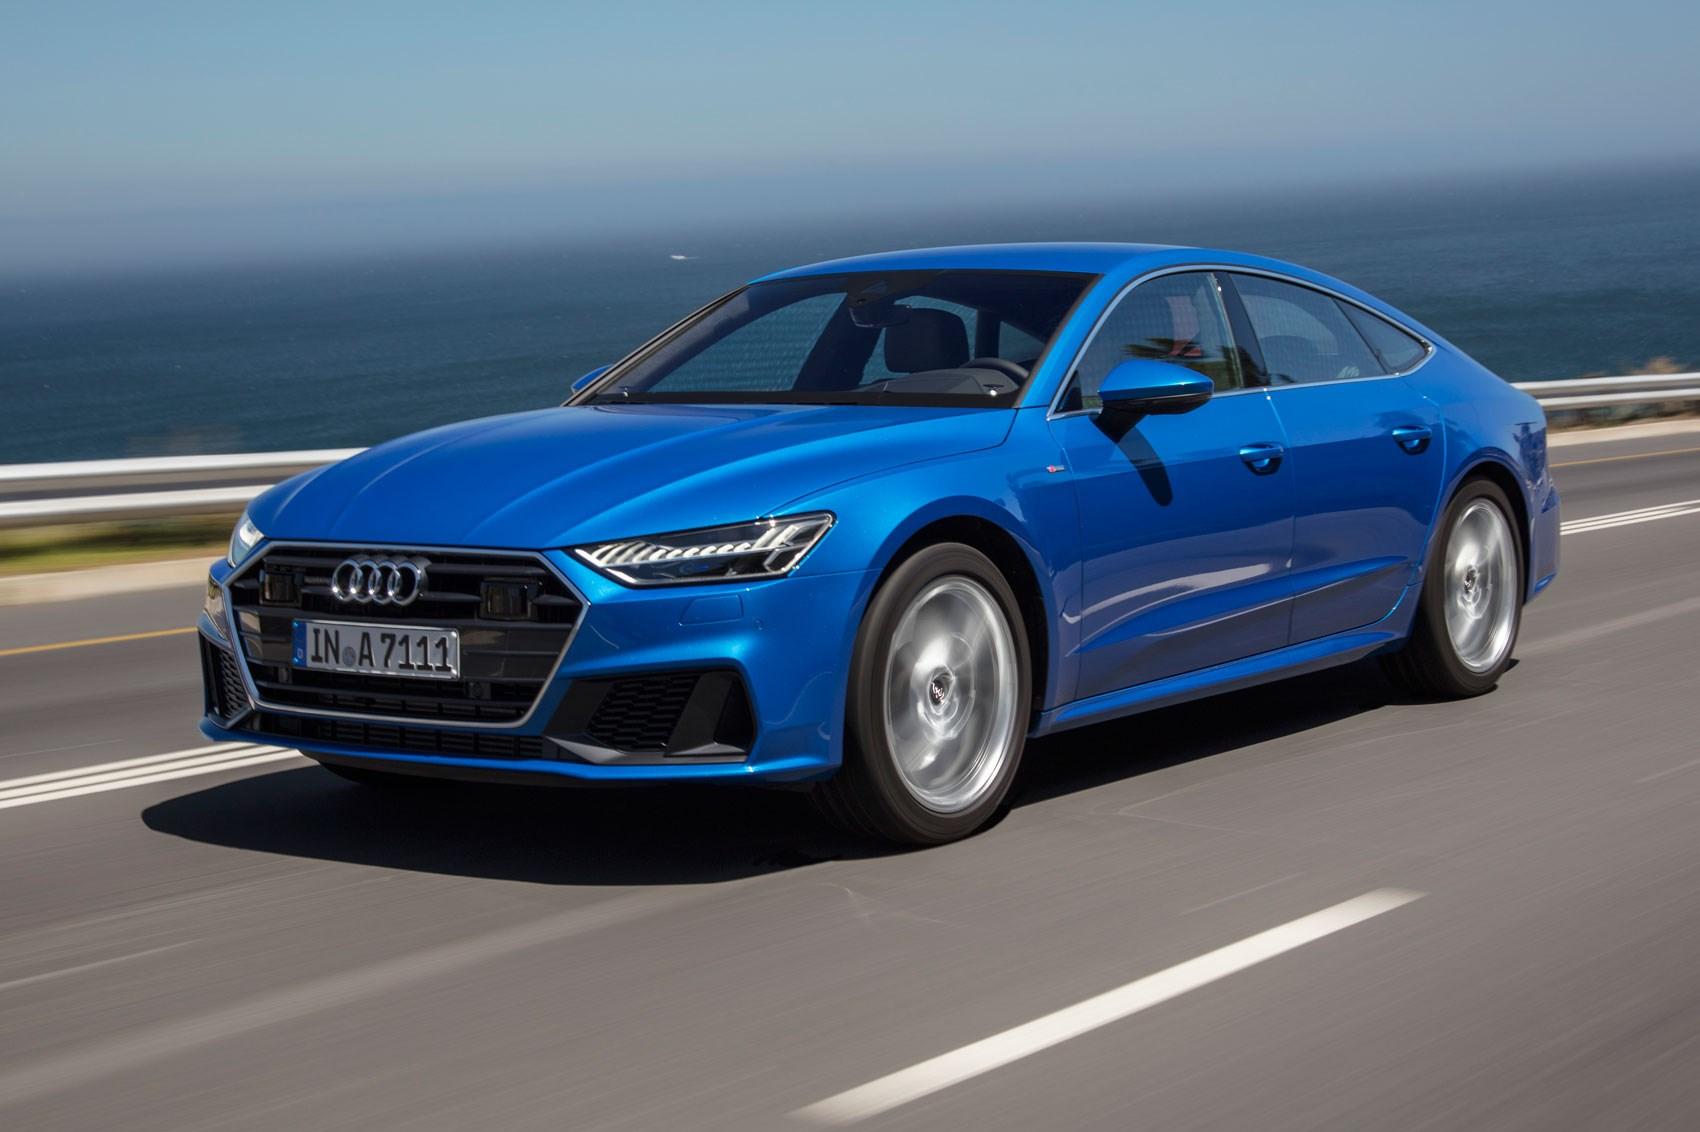 2018 Audi A7 >> New Audi A7 2018 Review The Sleek Exec Driven Car Magazine